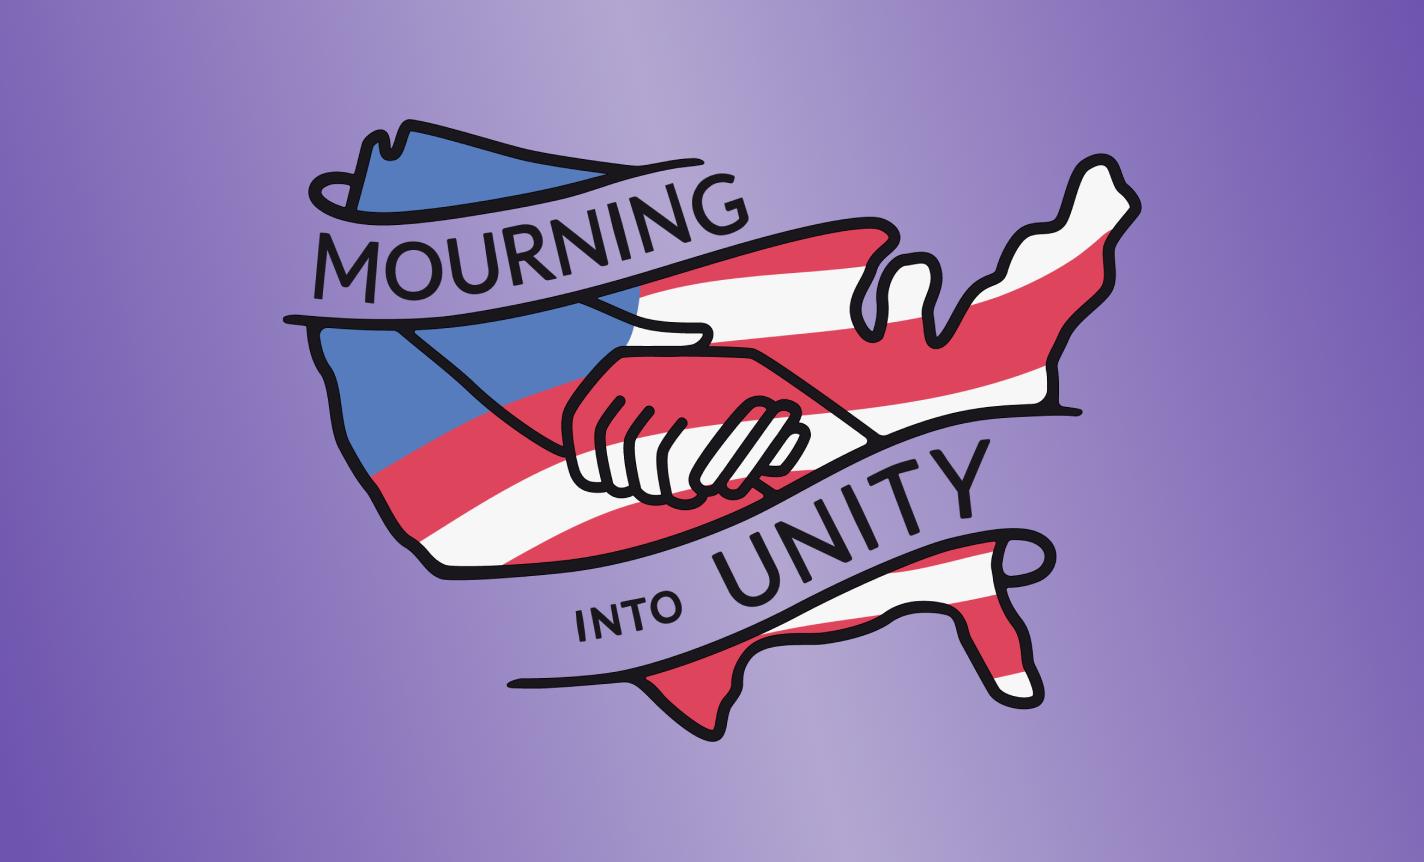 Mourning Into Unity: National Virtual Vigil on Election Eve